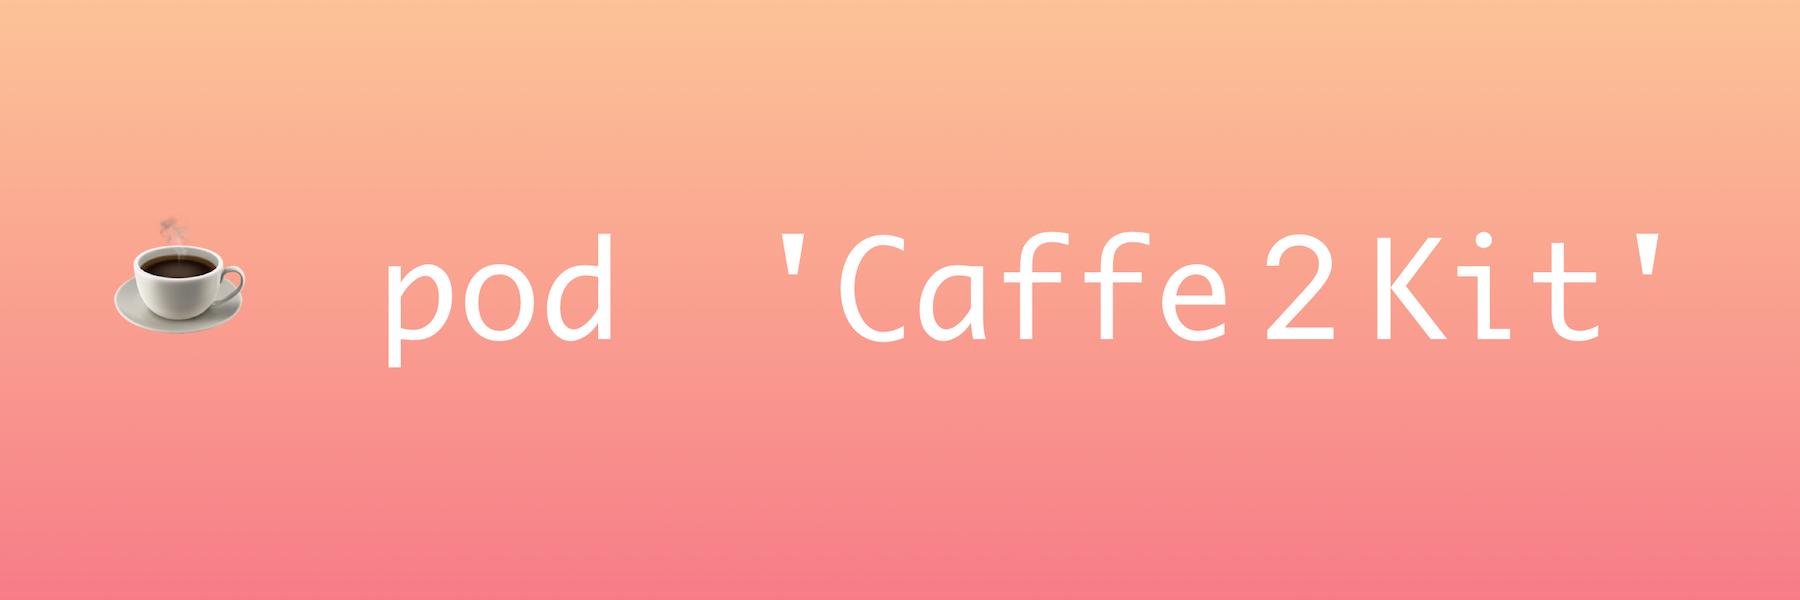 Caffe2Kit - Simple integration of Caffe2 on iOS.